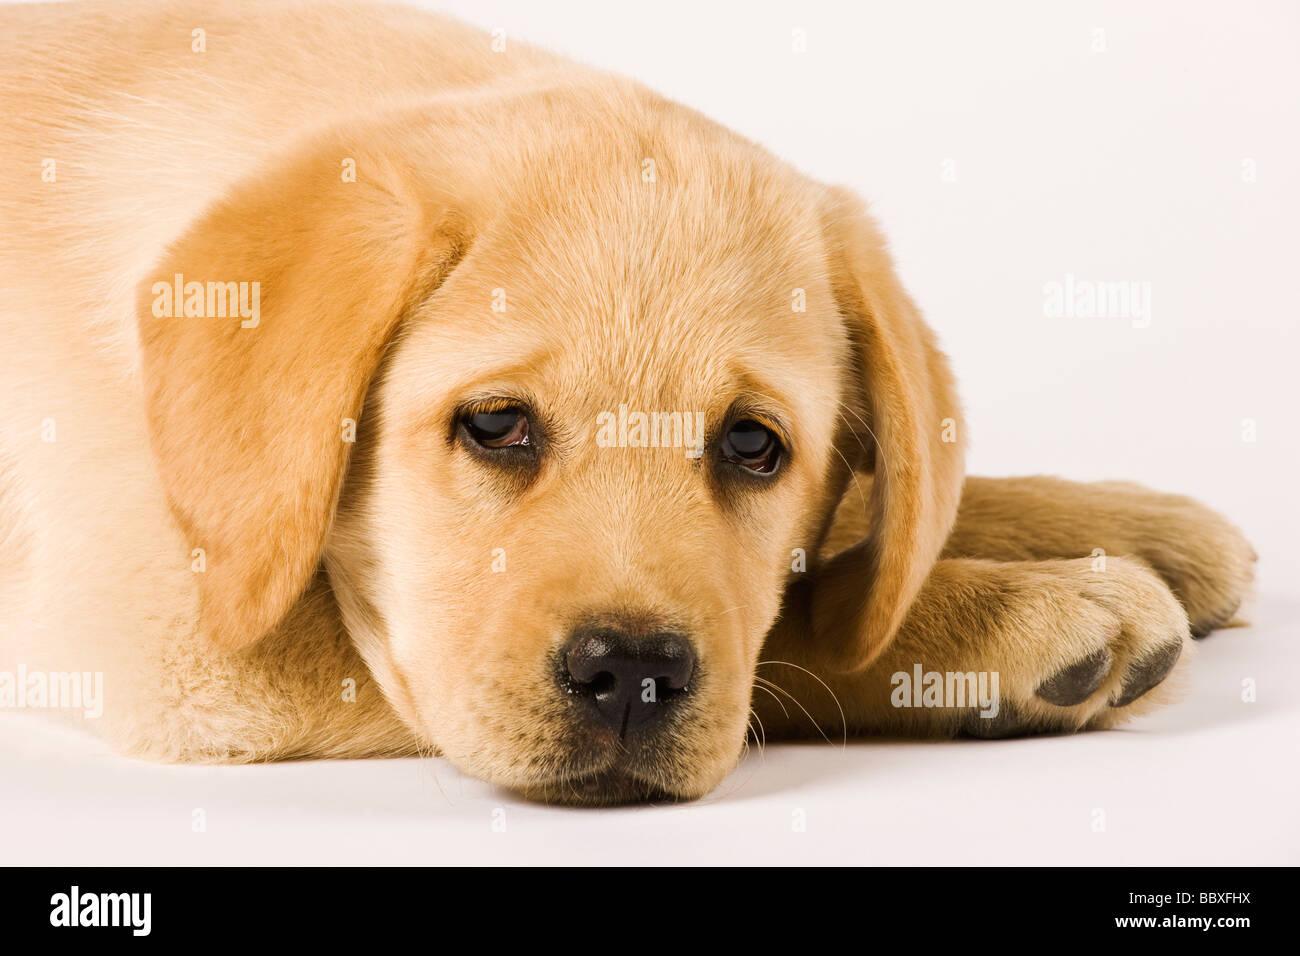 Golden Labrador Retriever Welpe Canis Familiaris Nahaufnahme Portrait von Labrador beliebte Arbeitshunde Stockbild